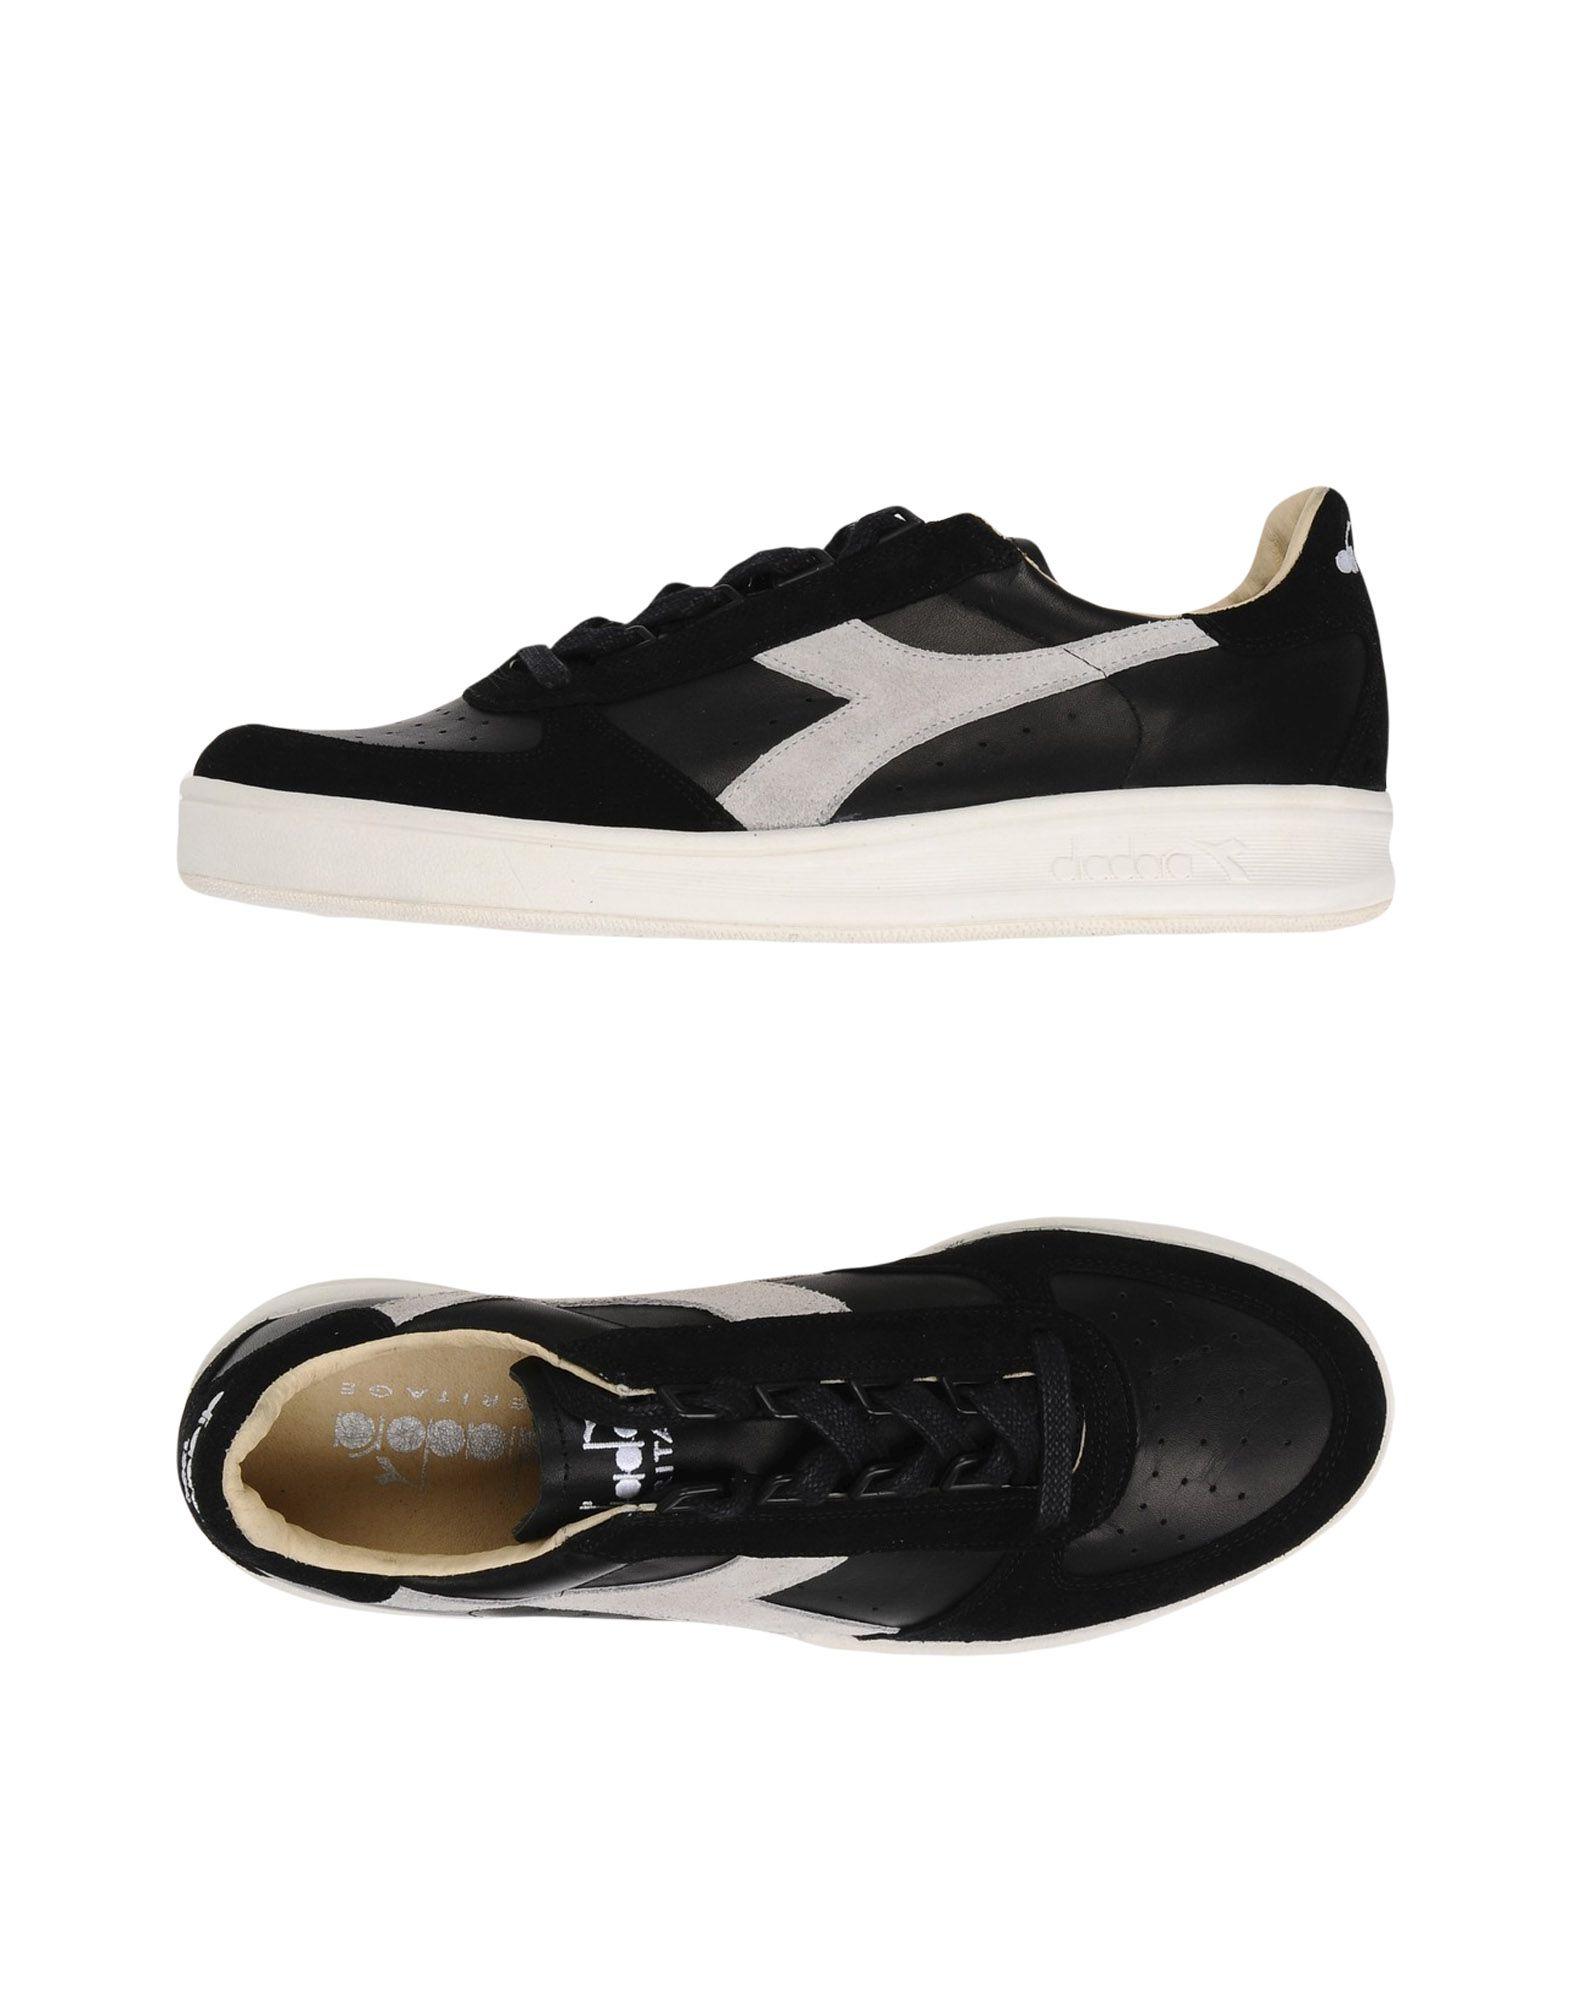 Sneakers Diadora Heritage B.Elite S L - Uomo - Acquista online su